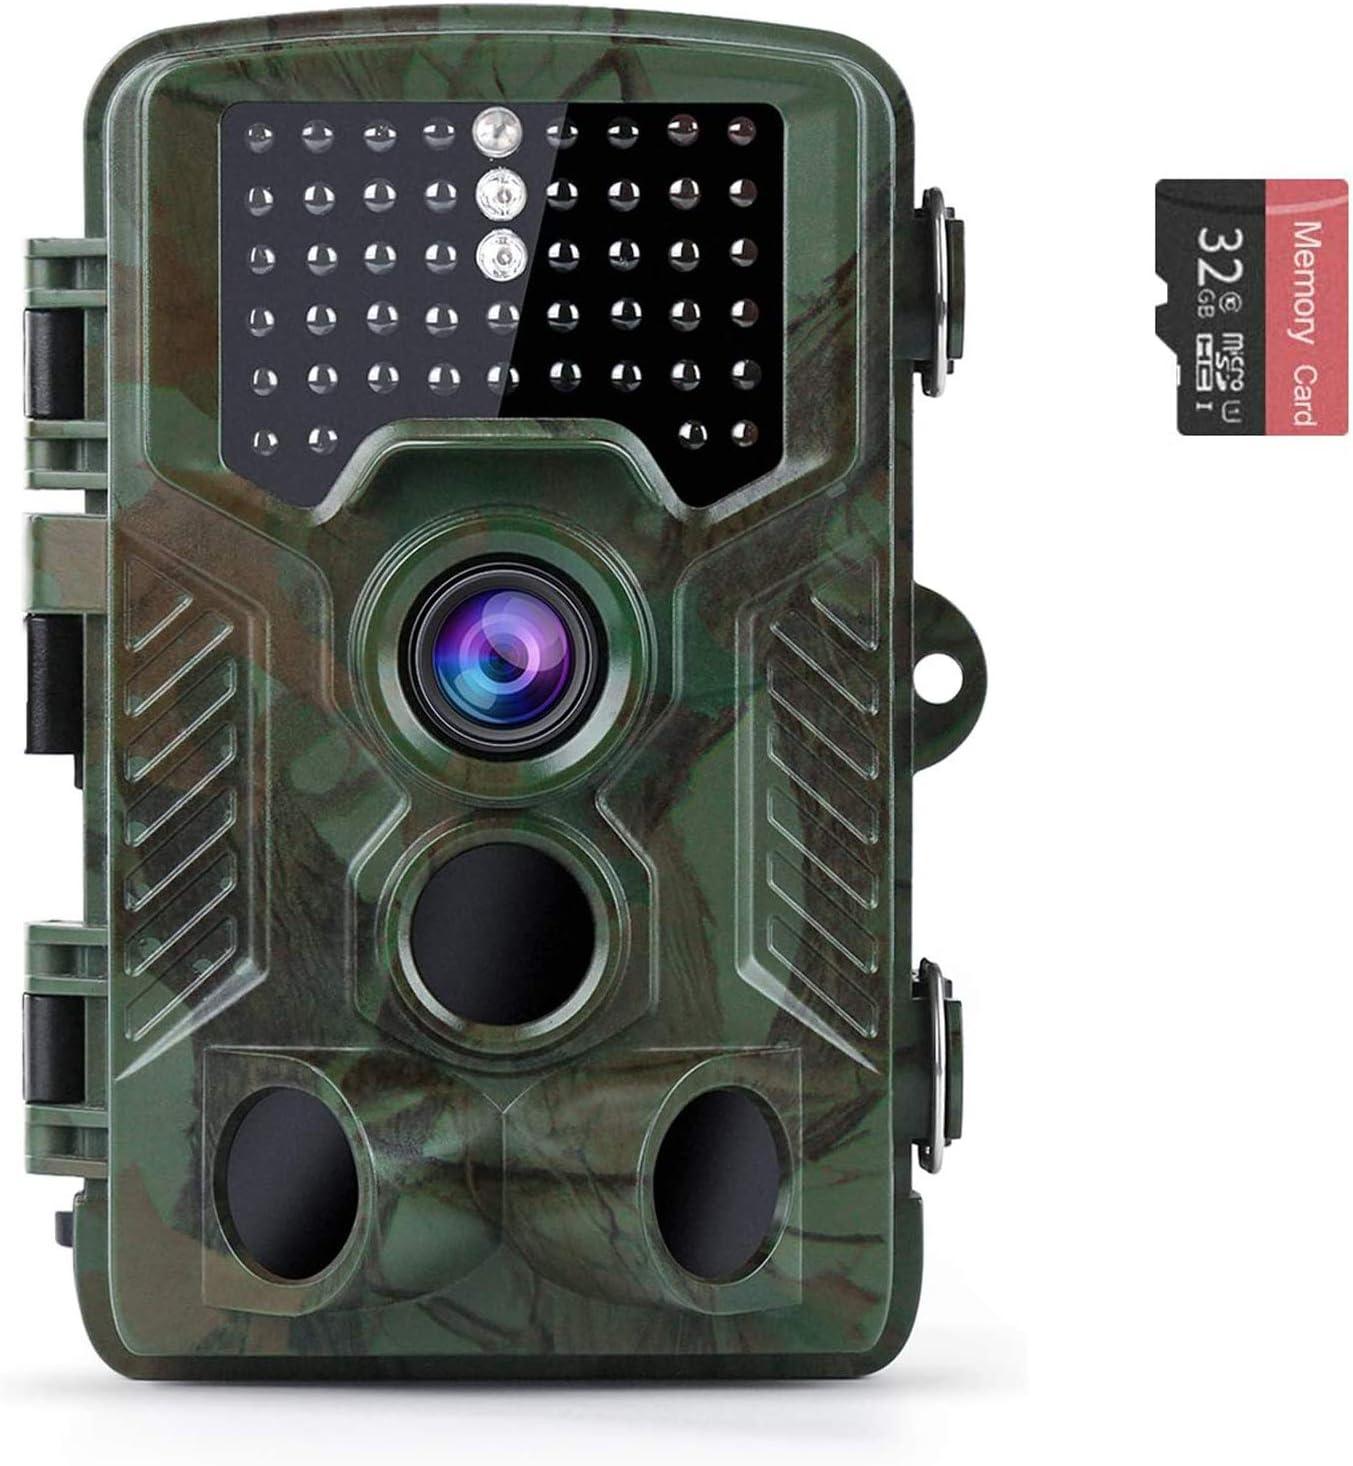 Coolife IP67 16MP 1080P 32GB Trail Camera $39.99 Coupon